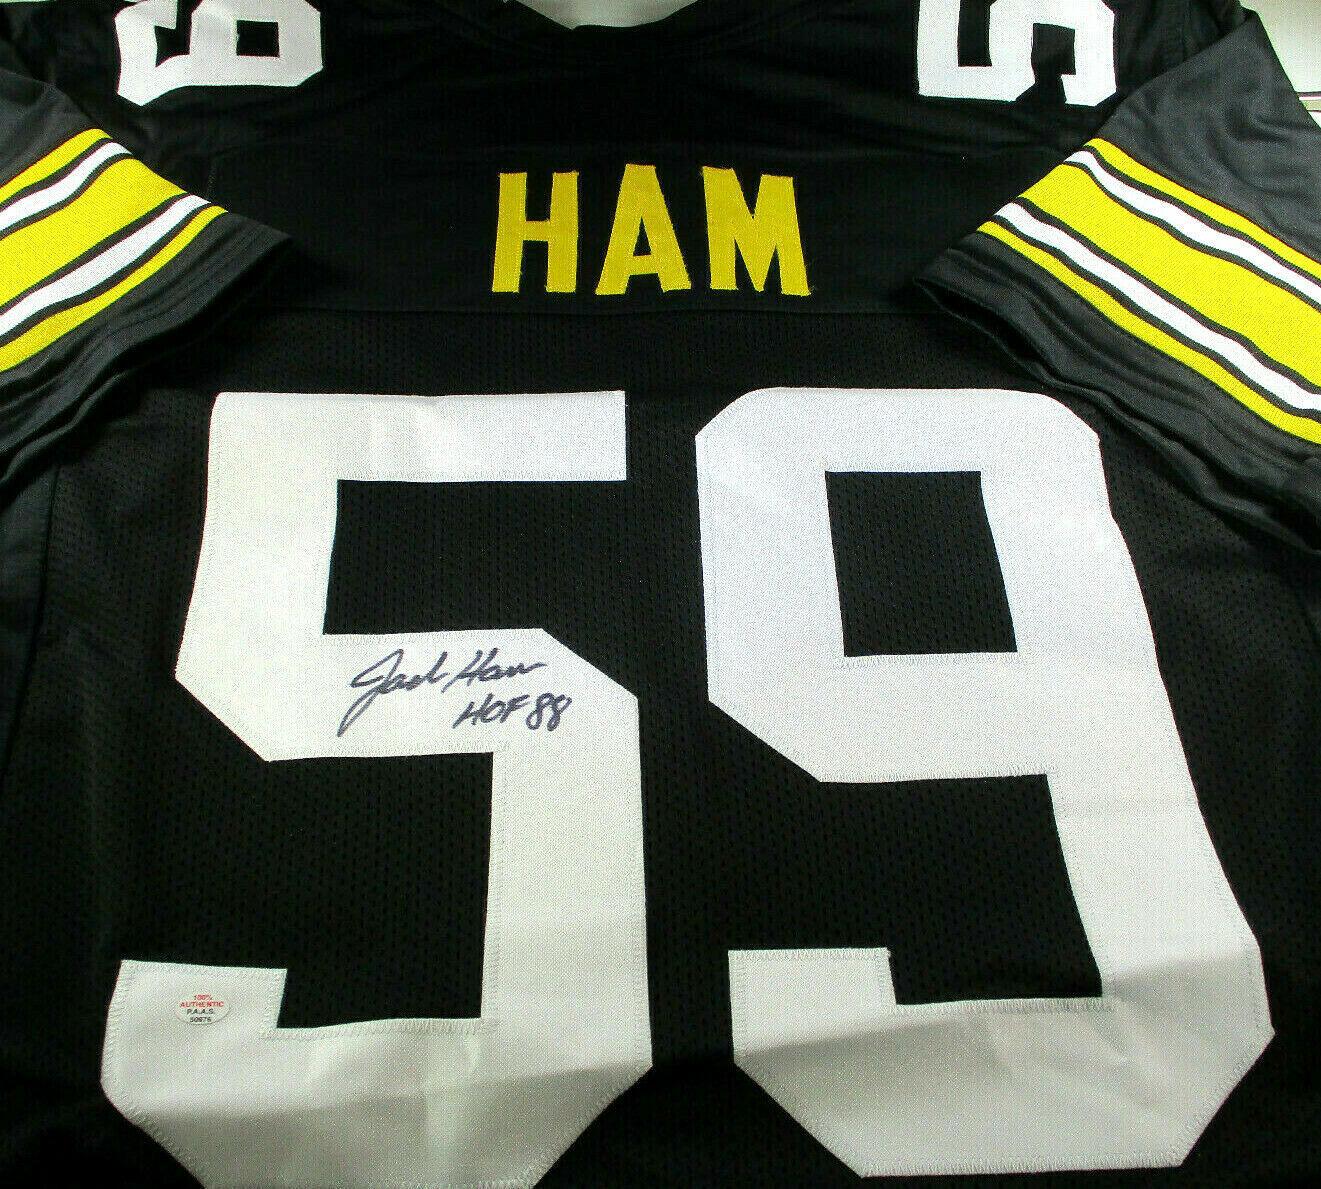 JACK HAM / NFL HALL OF FAME / AUTOGRAPHED PITTSBURGH SEELERS CUSTOM JERSEY / COA